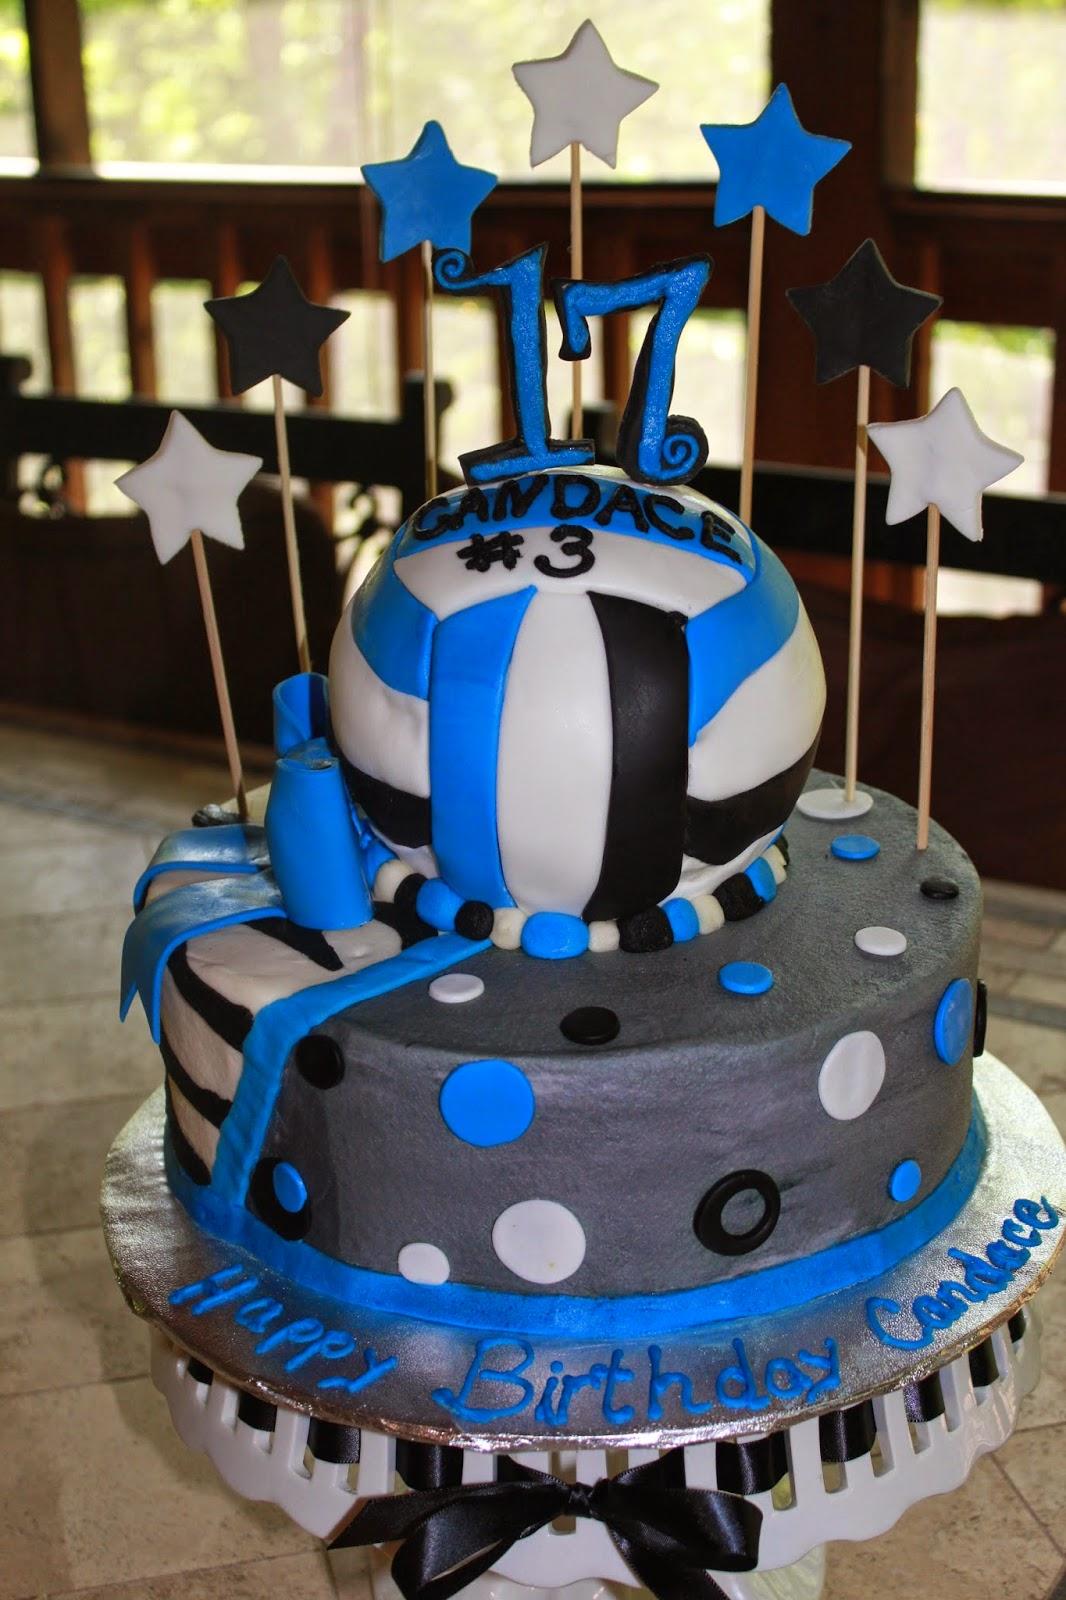 Designs By Lamuir Volleyball Birthday Cake Anyone